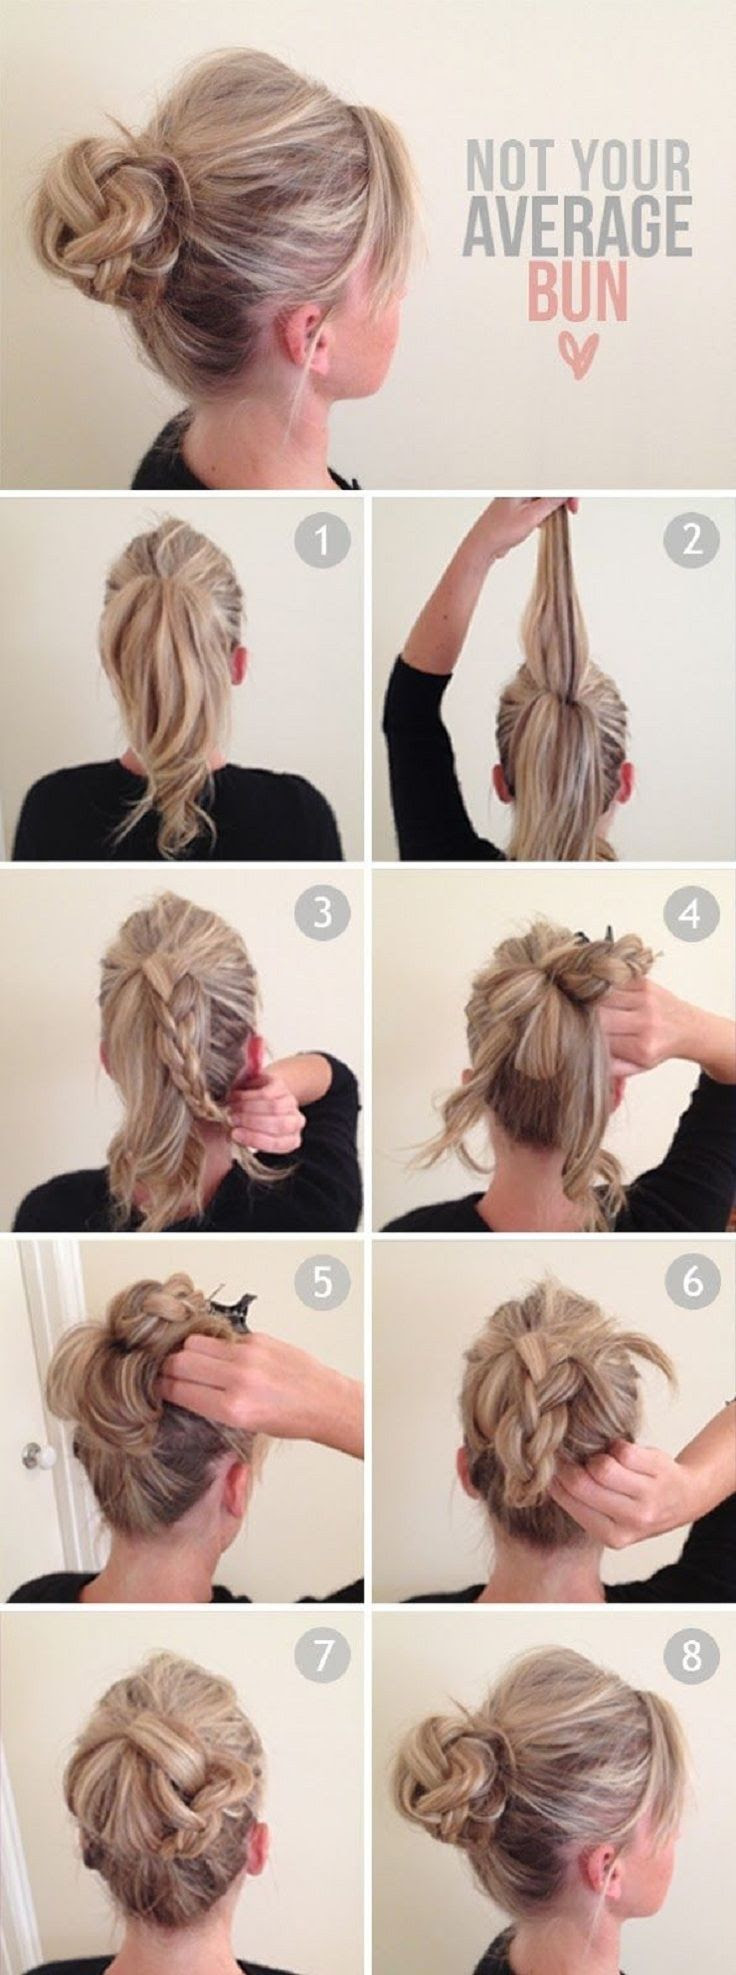 15 How To Do Hair Bun Hairstyle